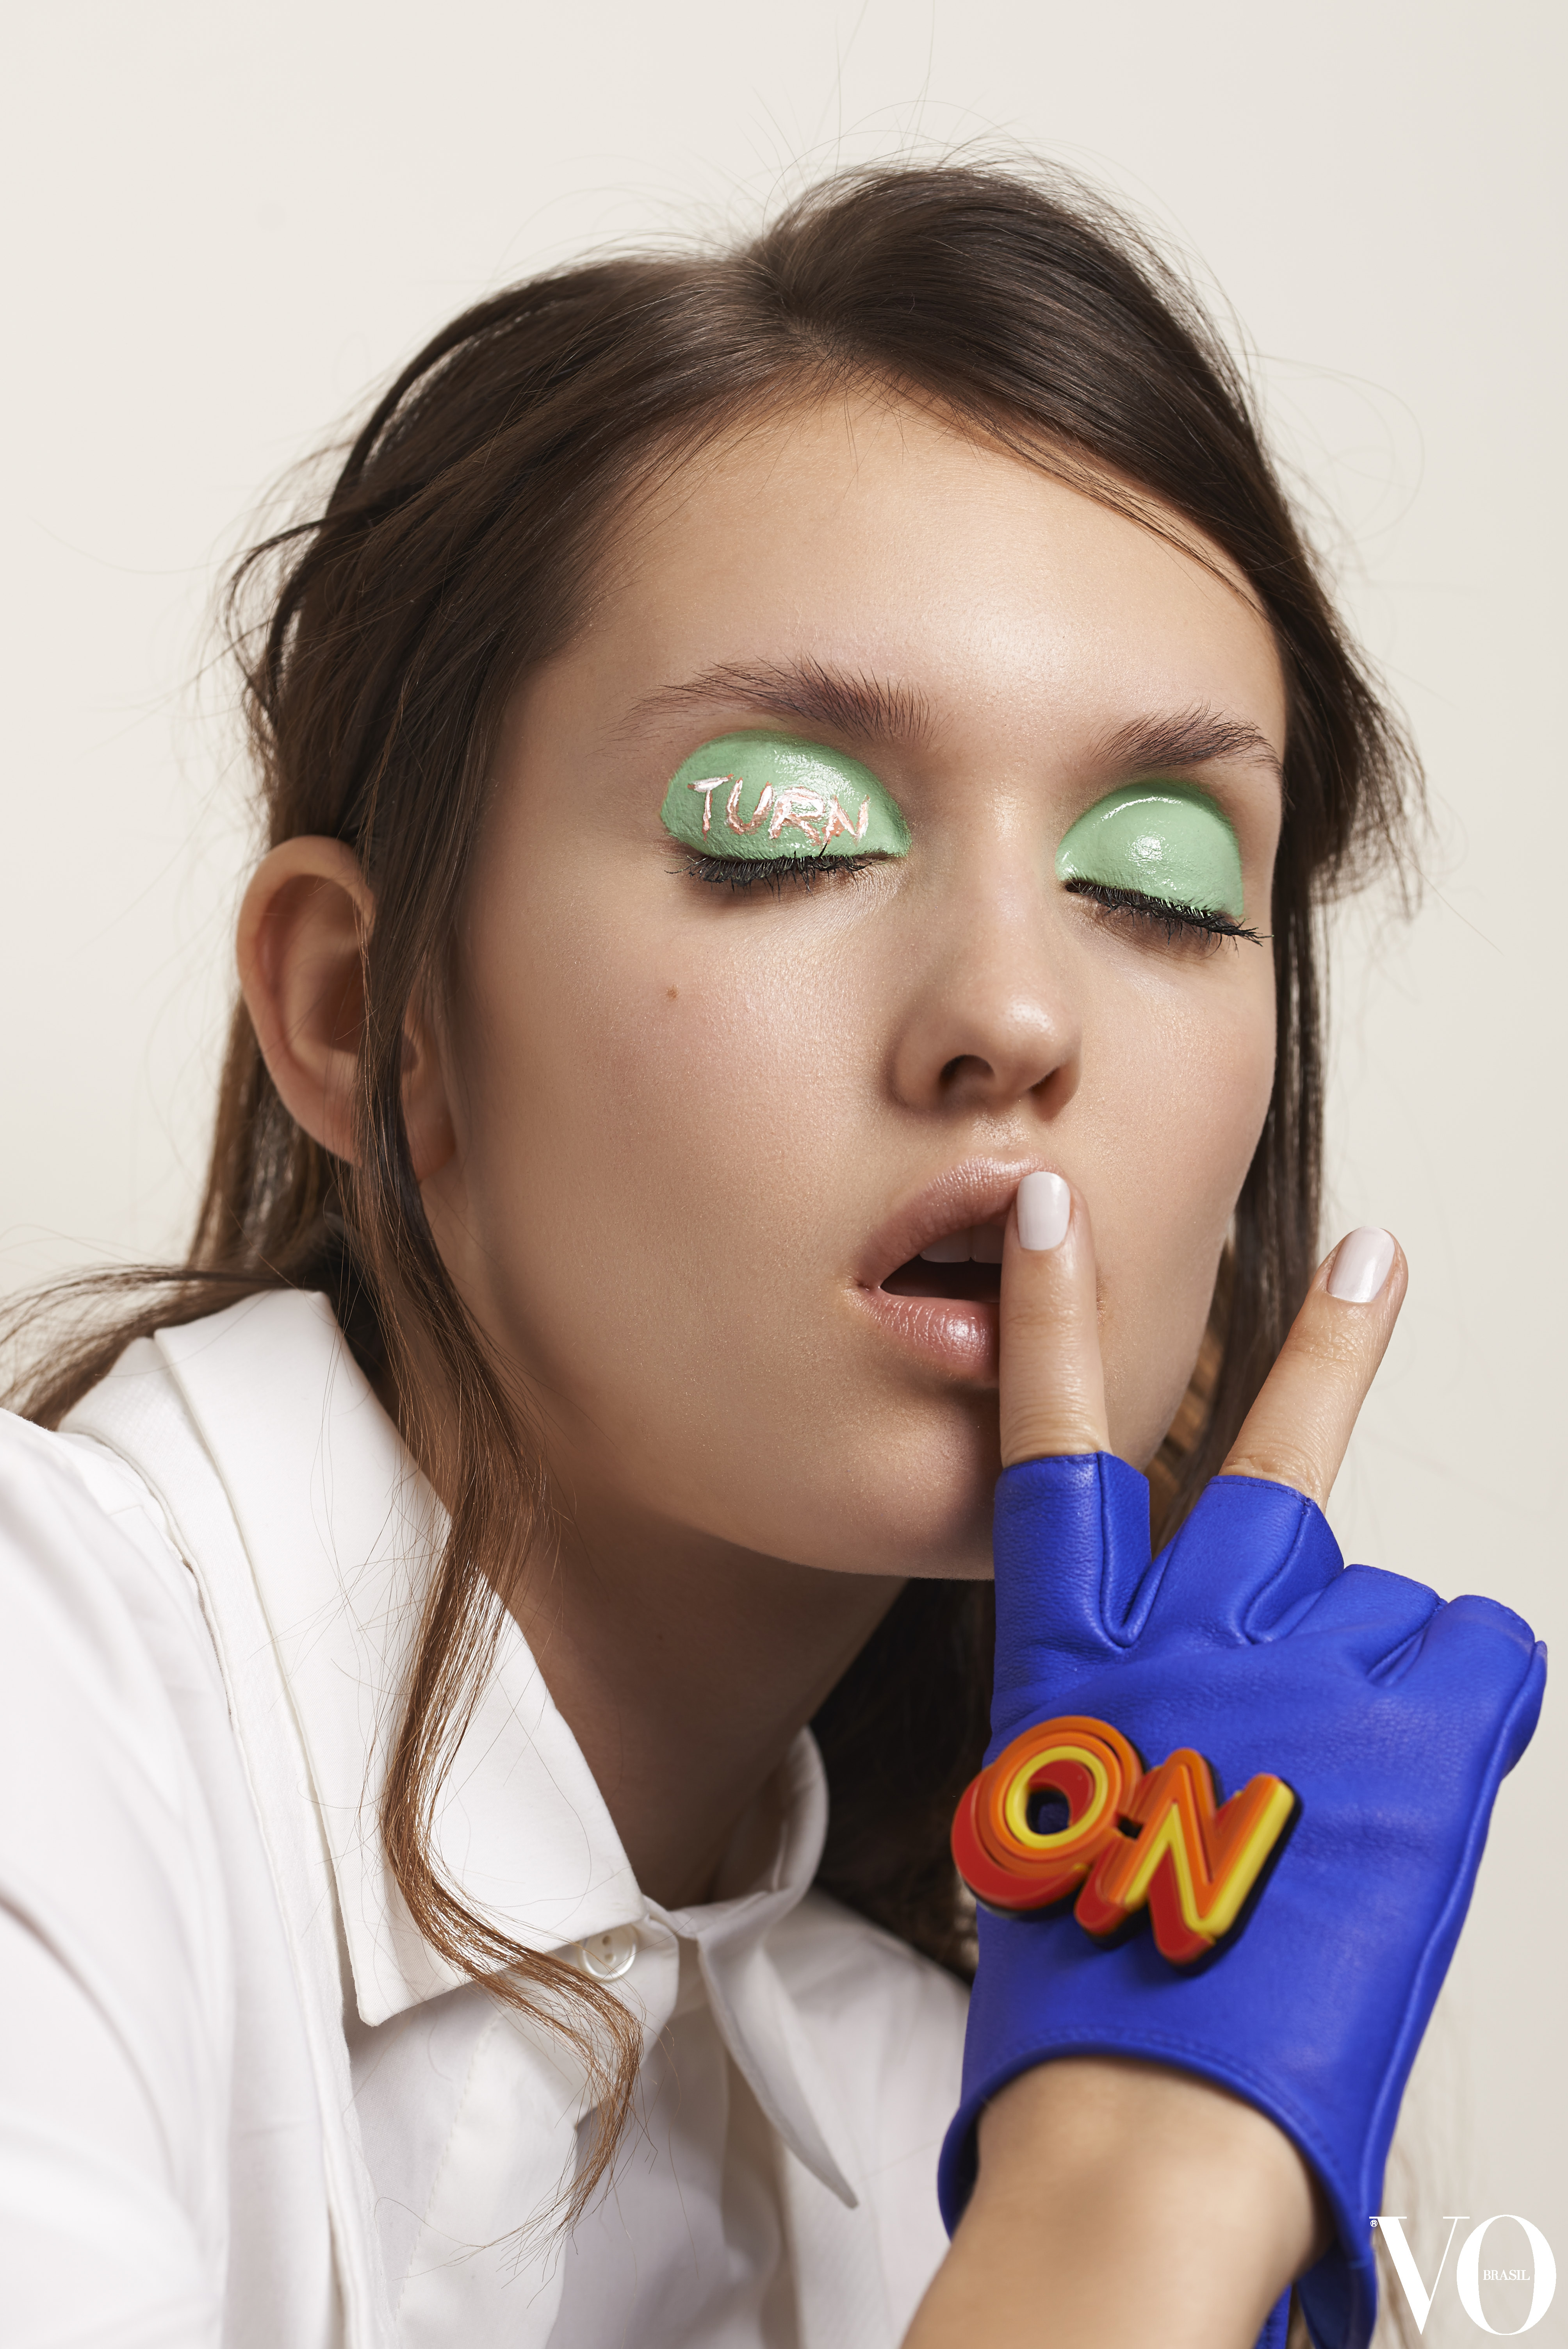 Fred Juno For Vogue Brasil